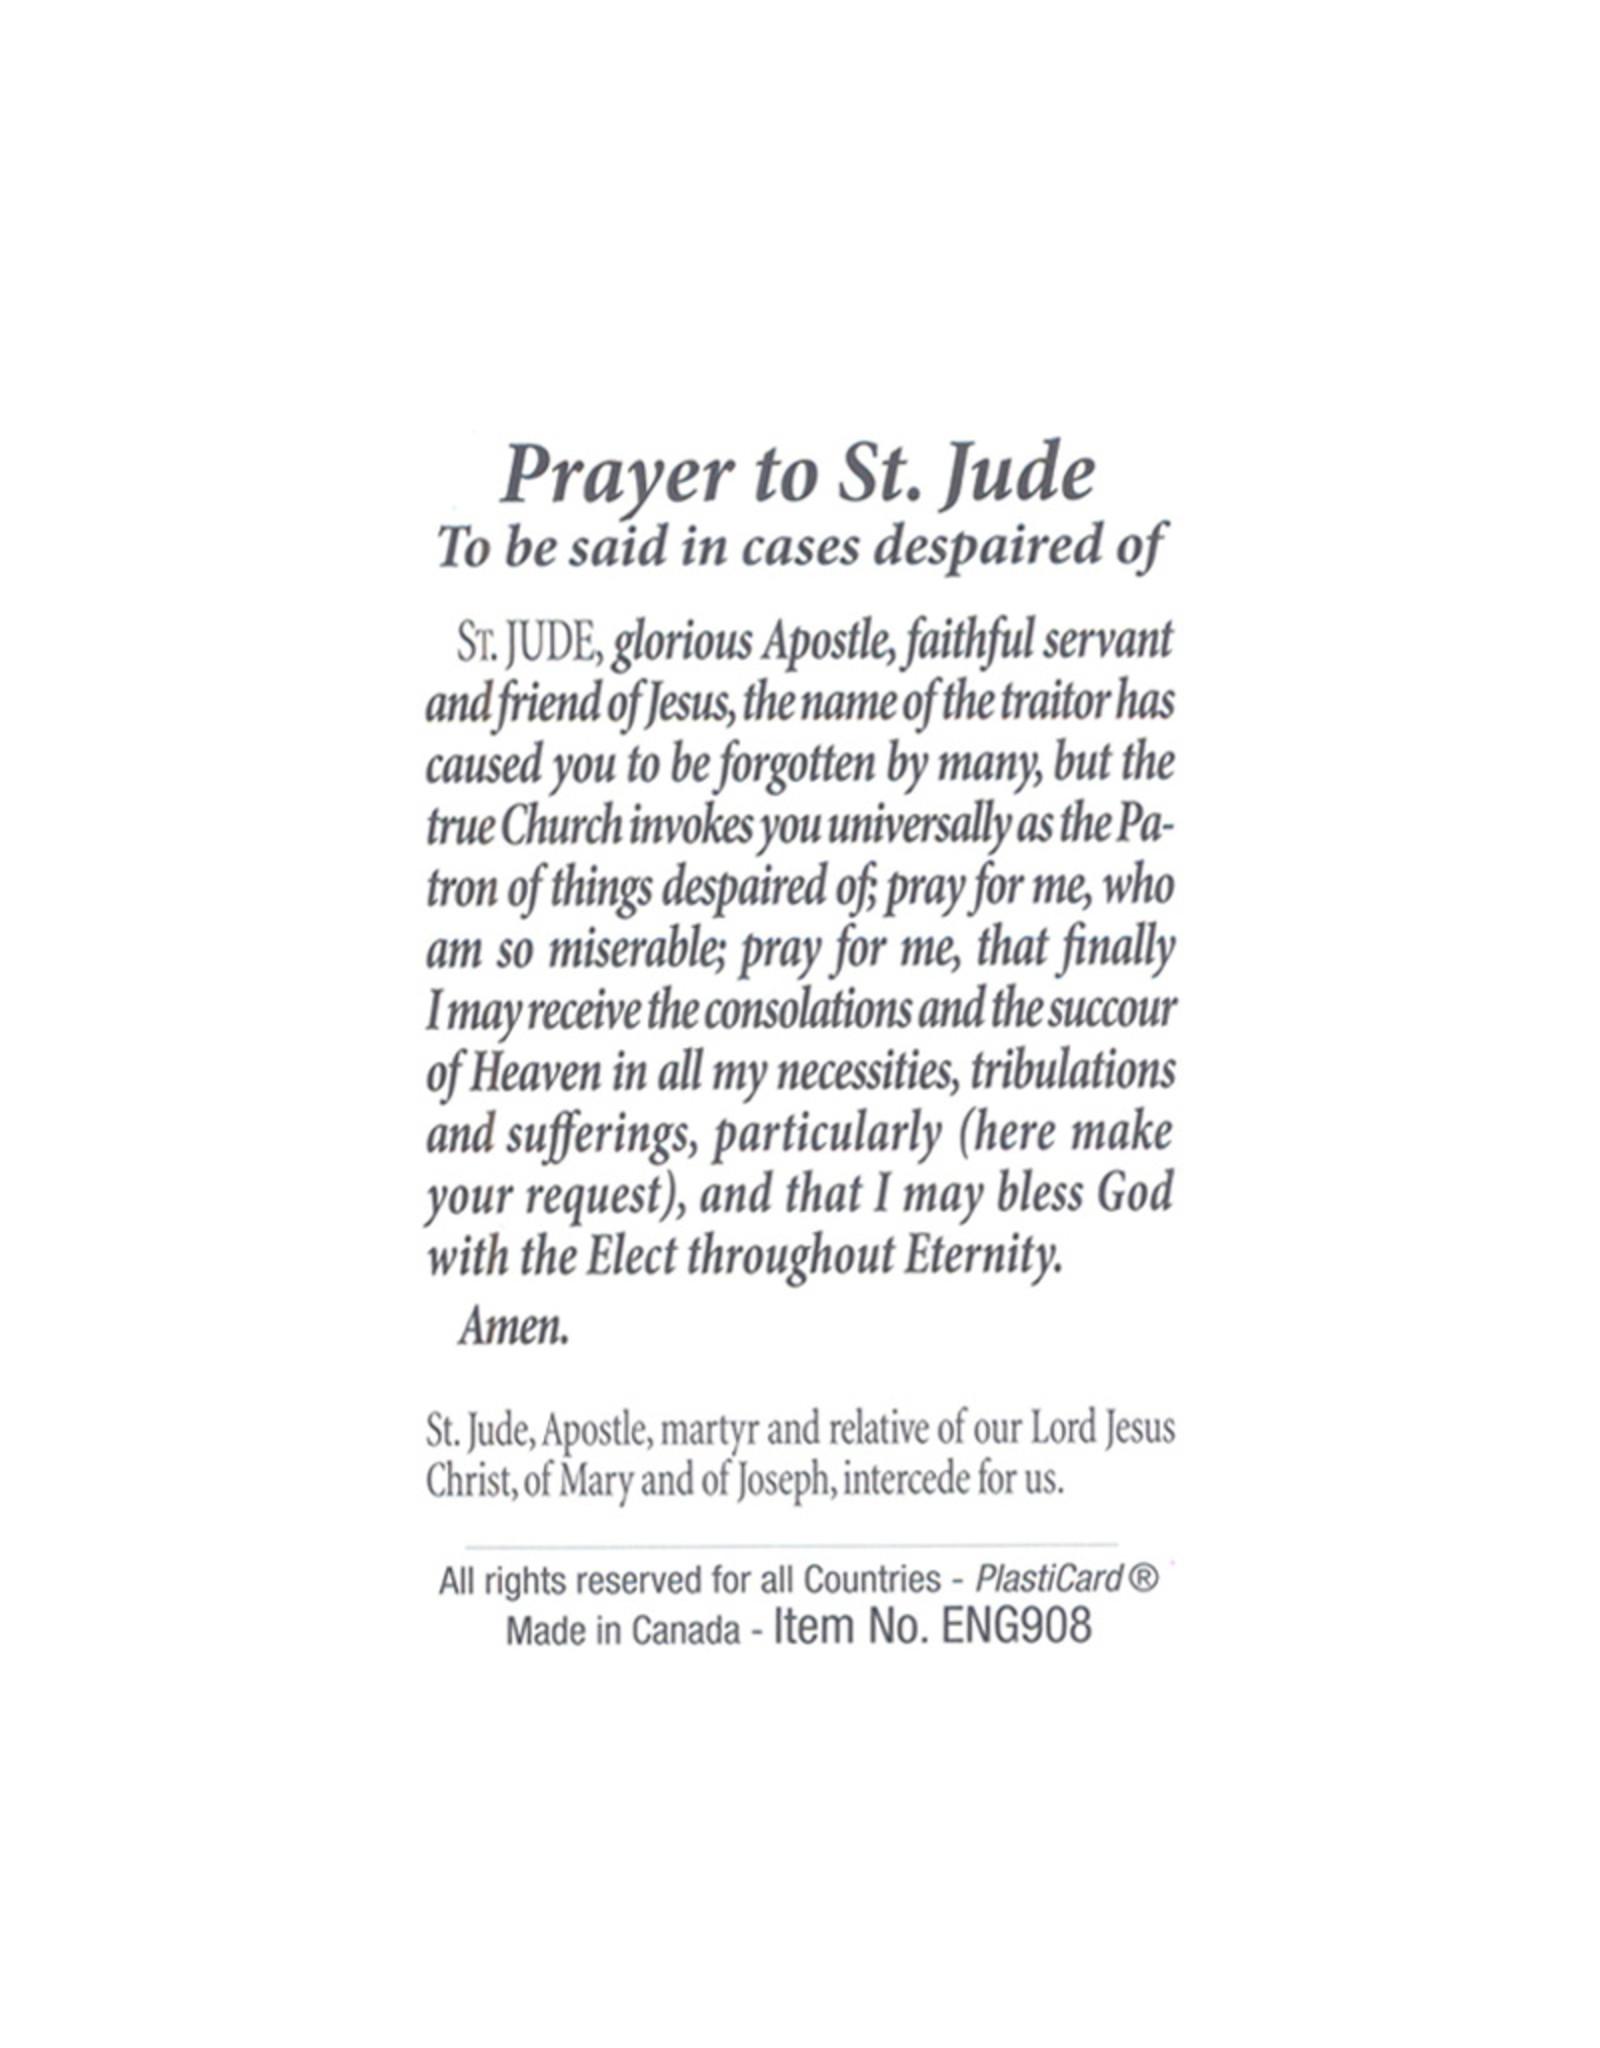 Saint Jude prayer card